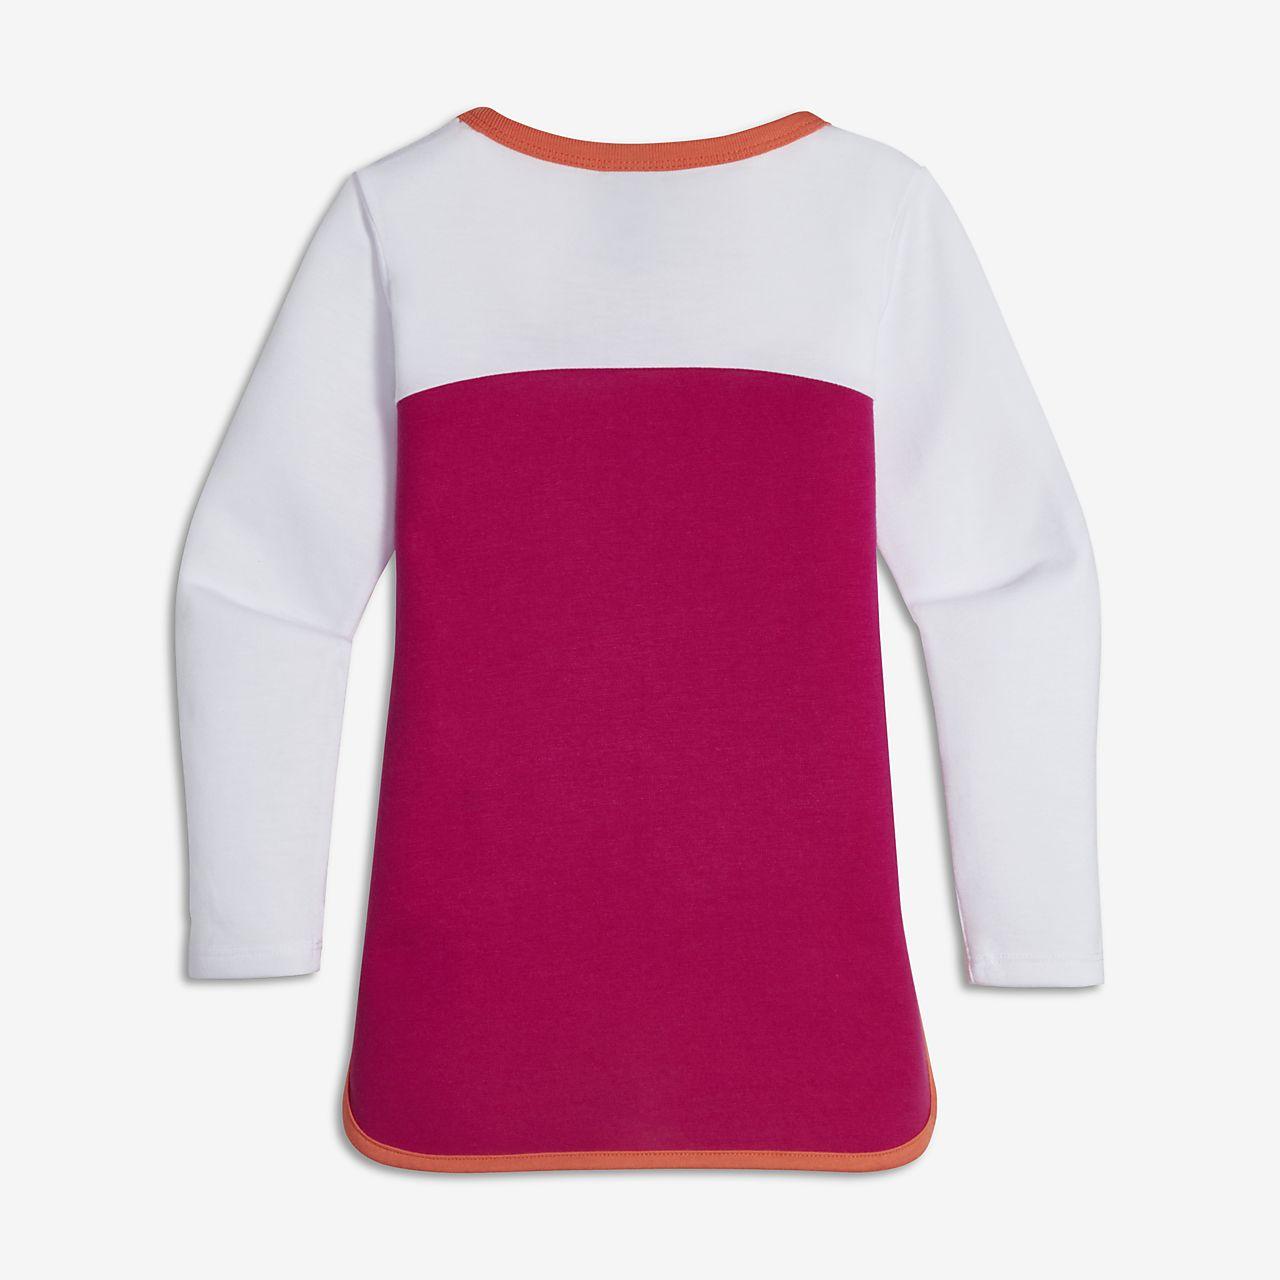 Nike Prep Little Kids 39 Girls 39 Long Sleeve Shirt